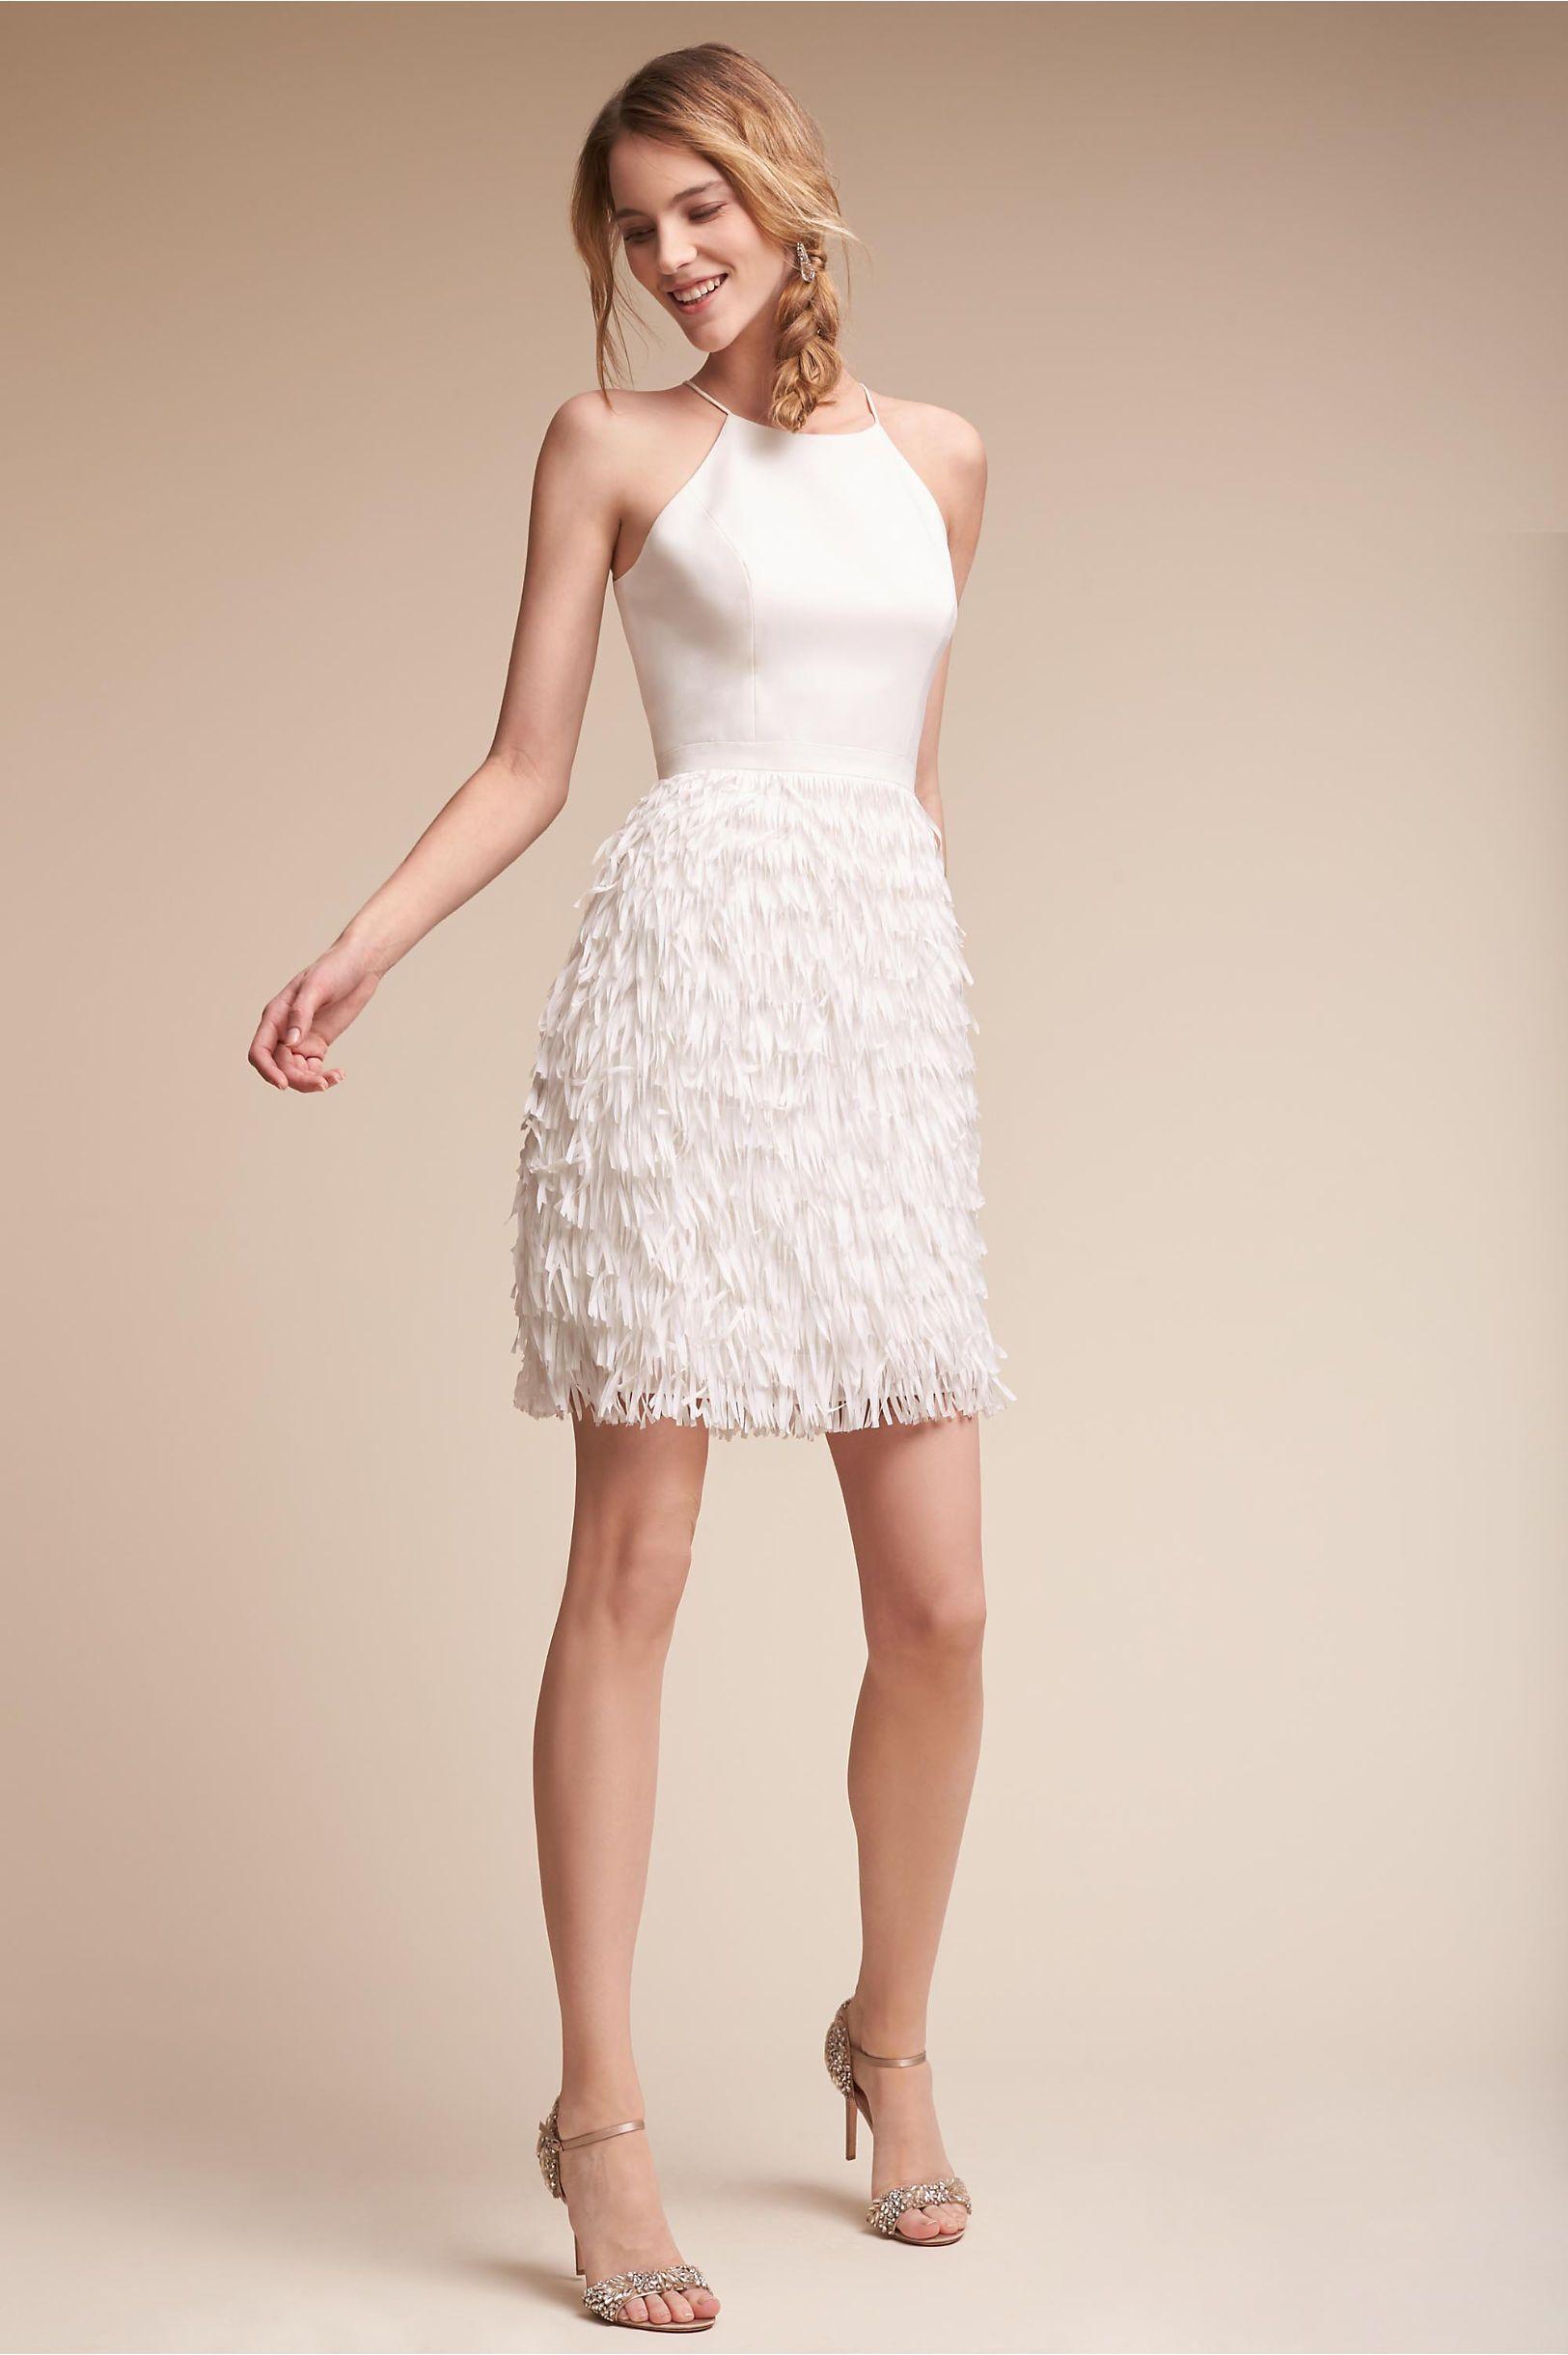 BHLDN Promenade Dress Ivory in Bride   BHLDN   Fashion   Pinterest